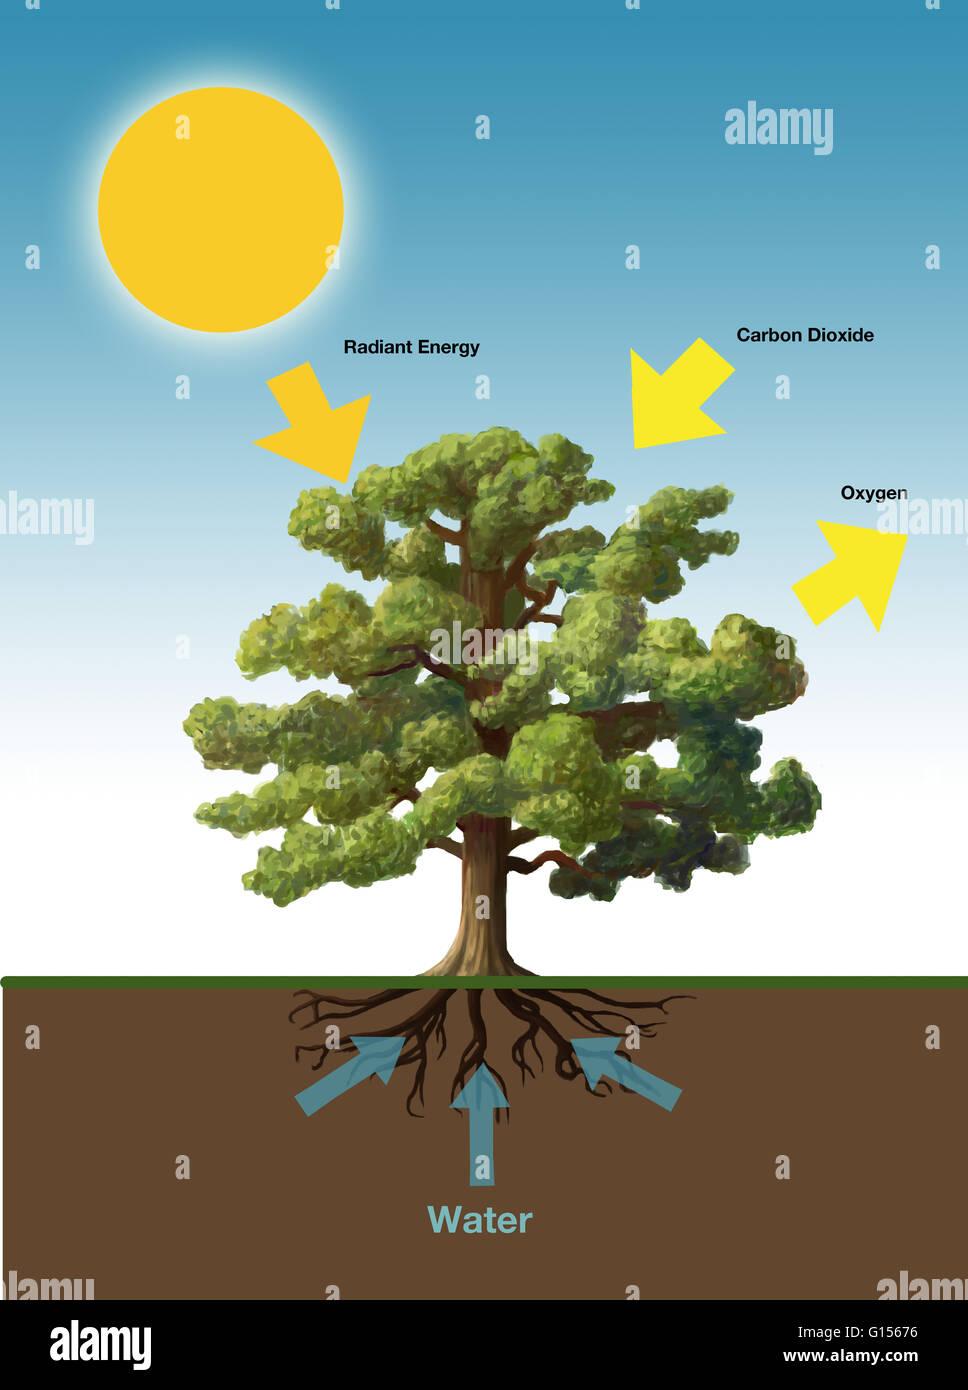 describe the process of photosynthesis